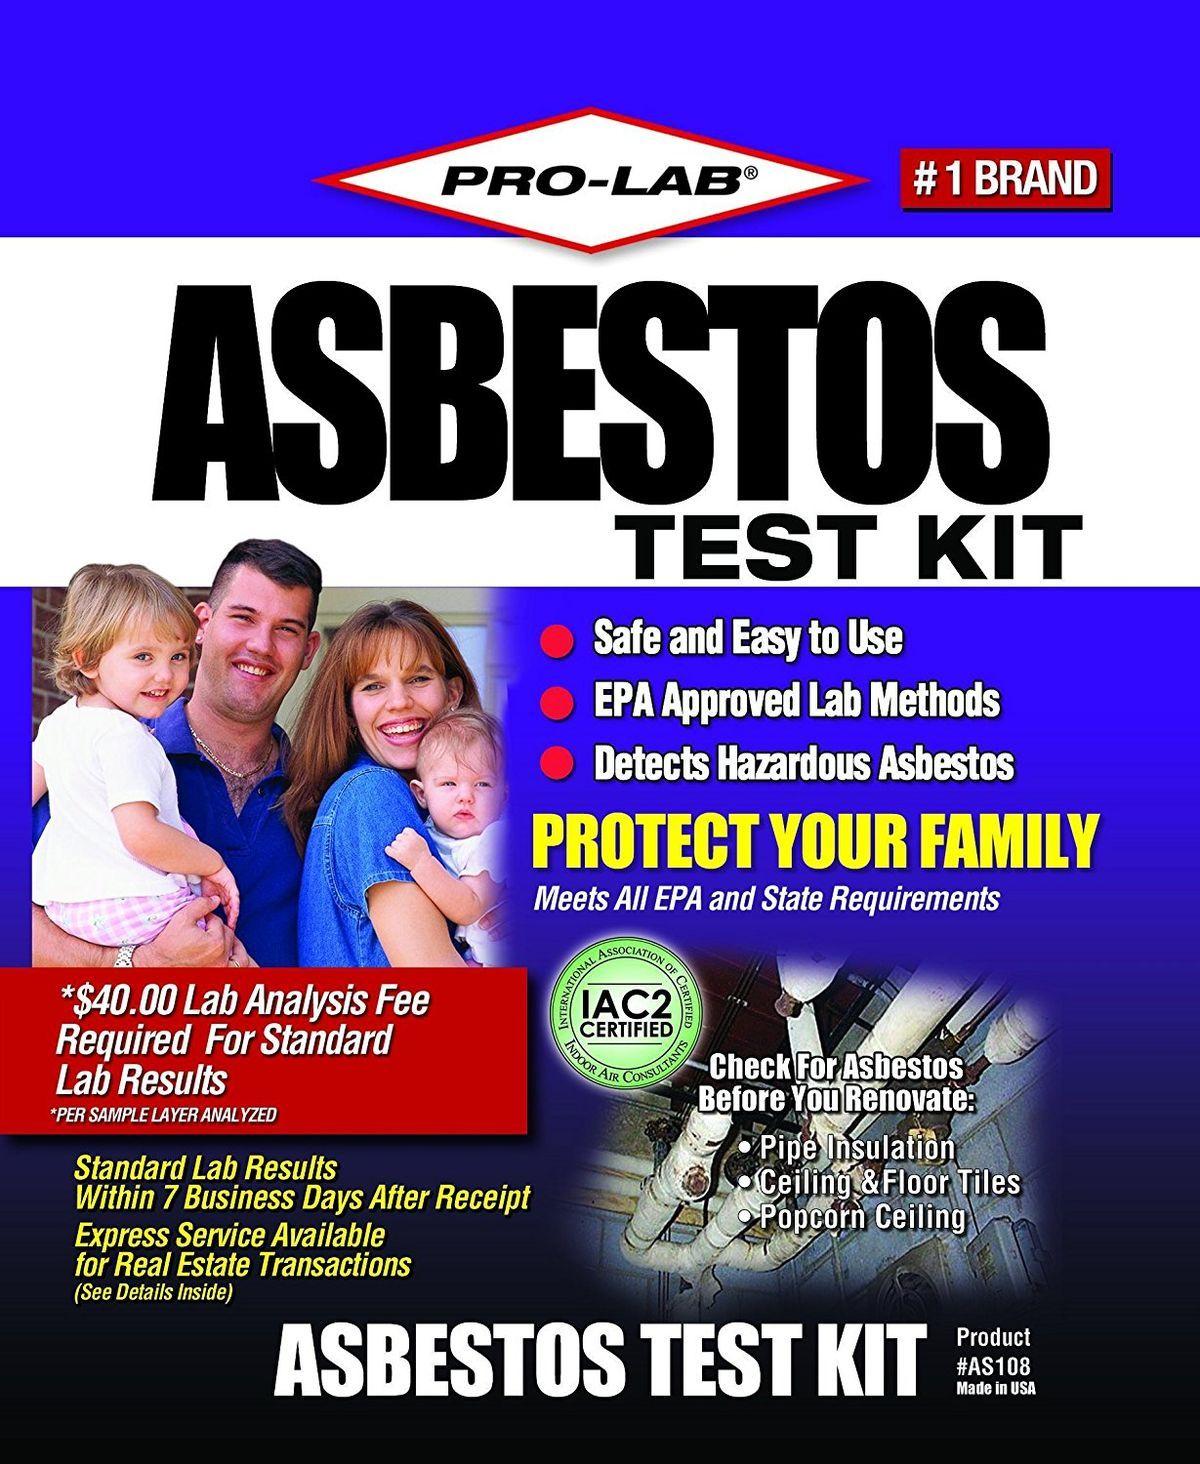 Diy asbestos test kit home depot asbestos testing pinterest diy asbestos test kit home depot solutioingenieria Choice Image